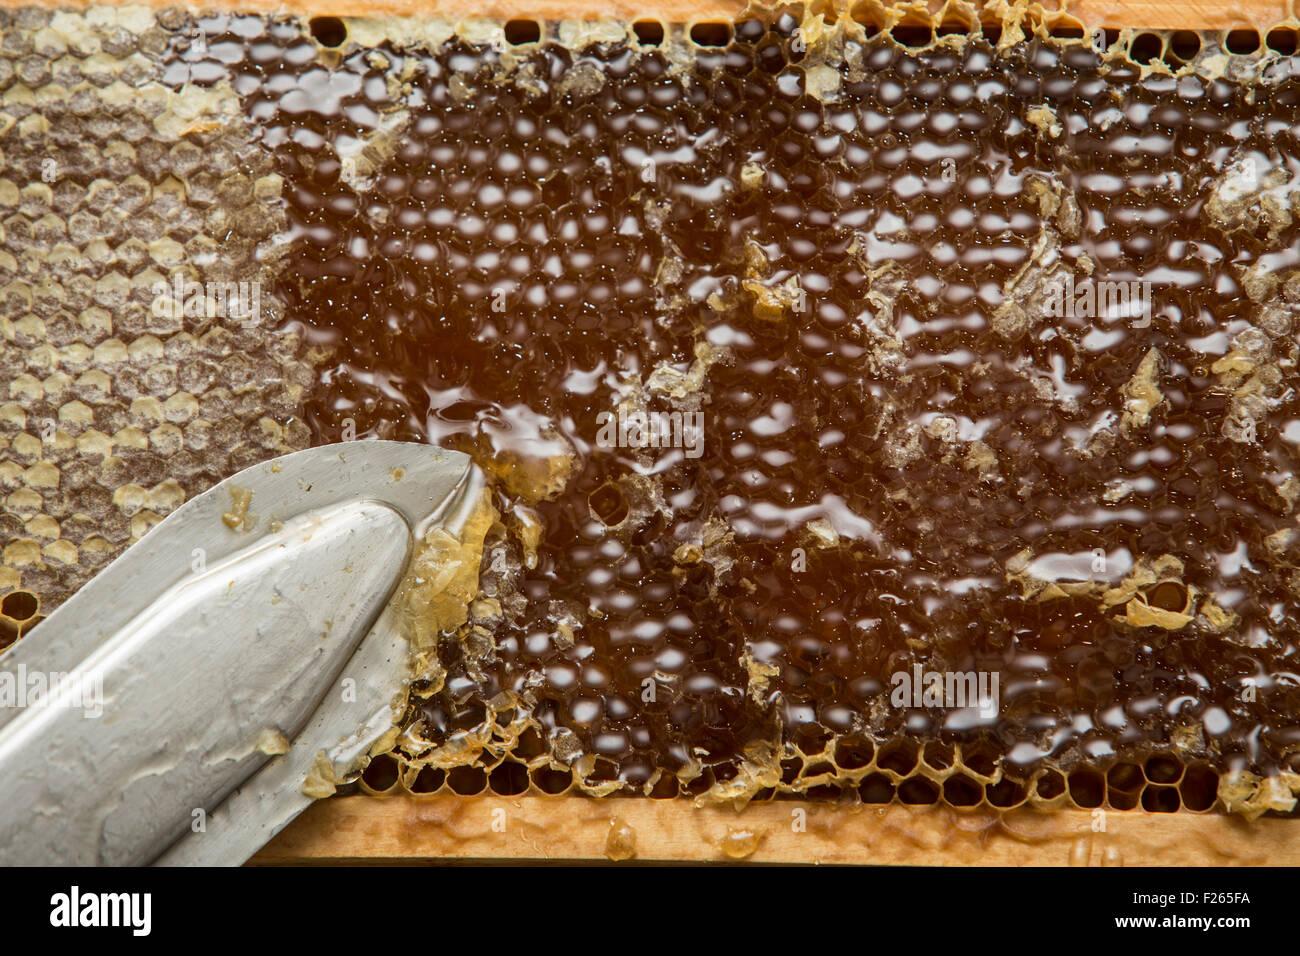 beekeeper removed beeswax - Stock Image